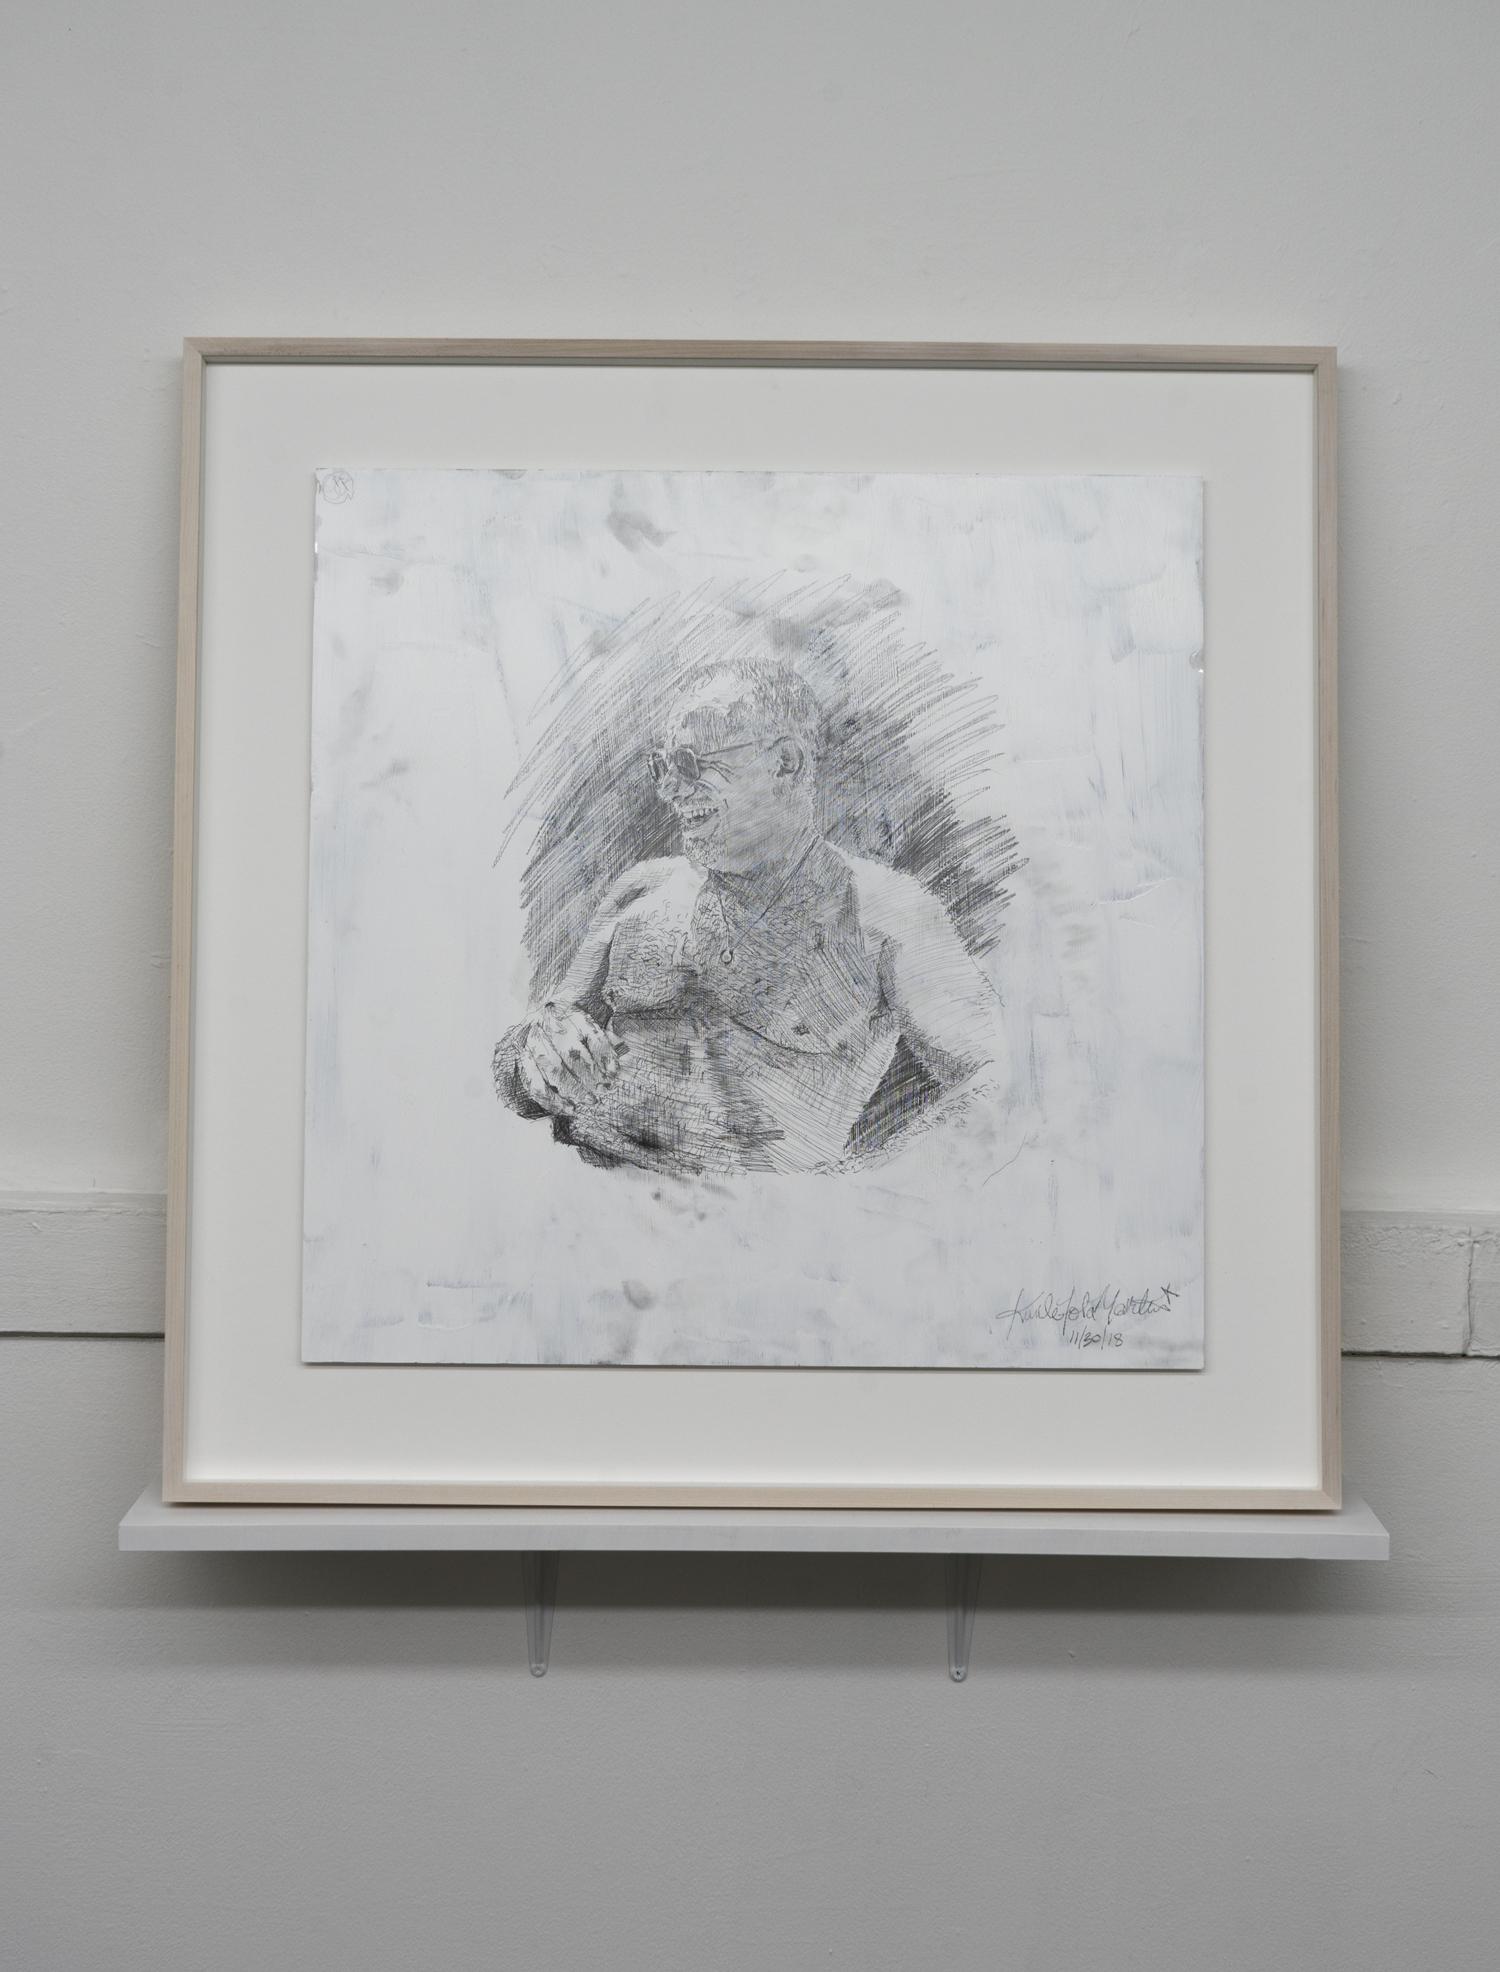 Kunle F. Martins,  Jack,  2019, pencil on found white cardboard box, 31 × 31 inches